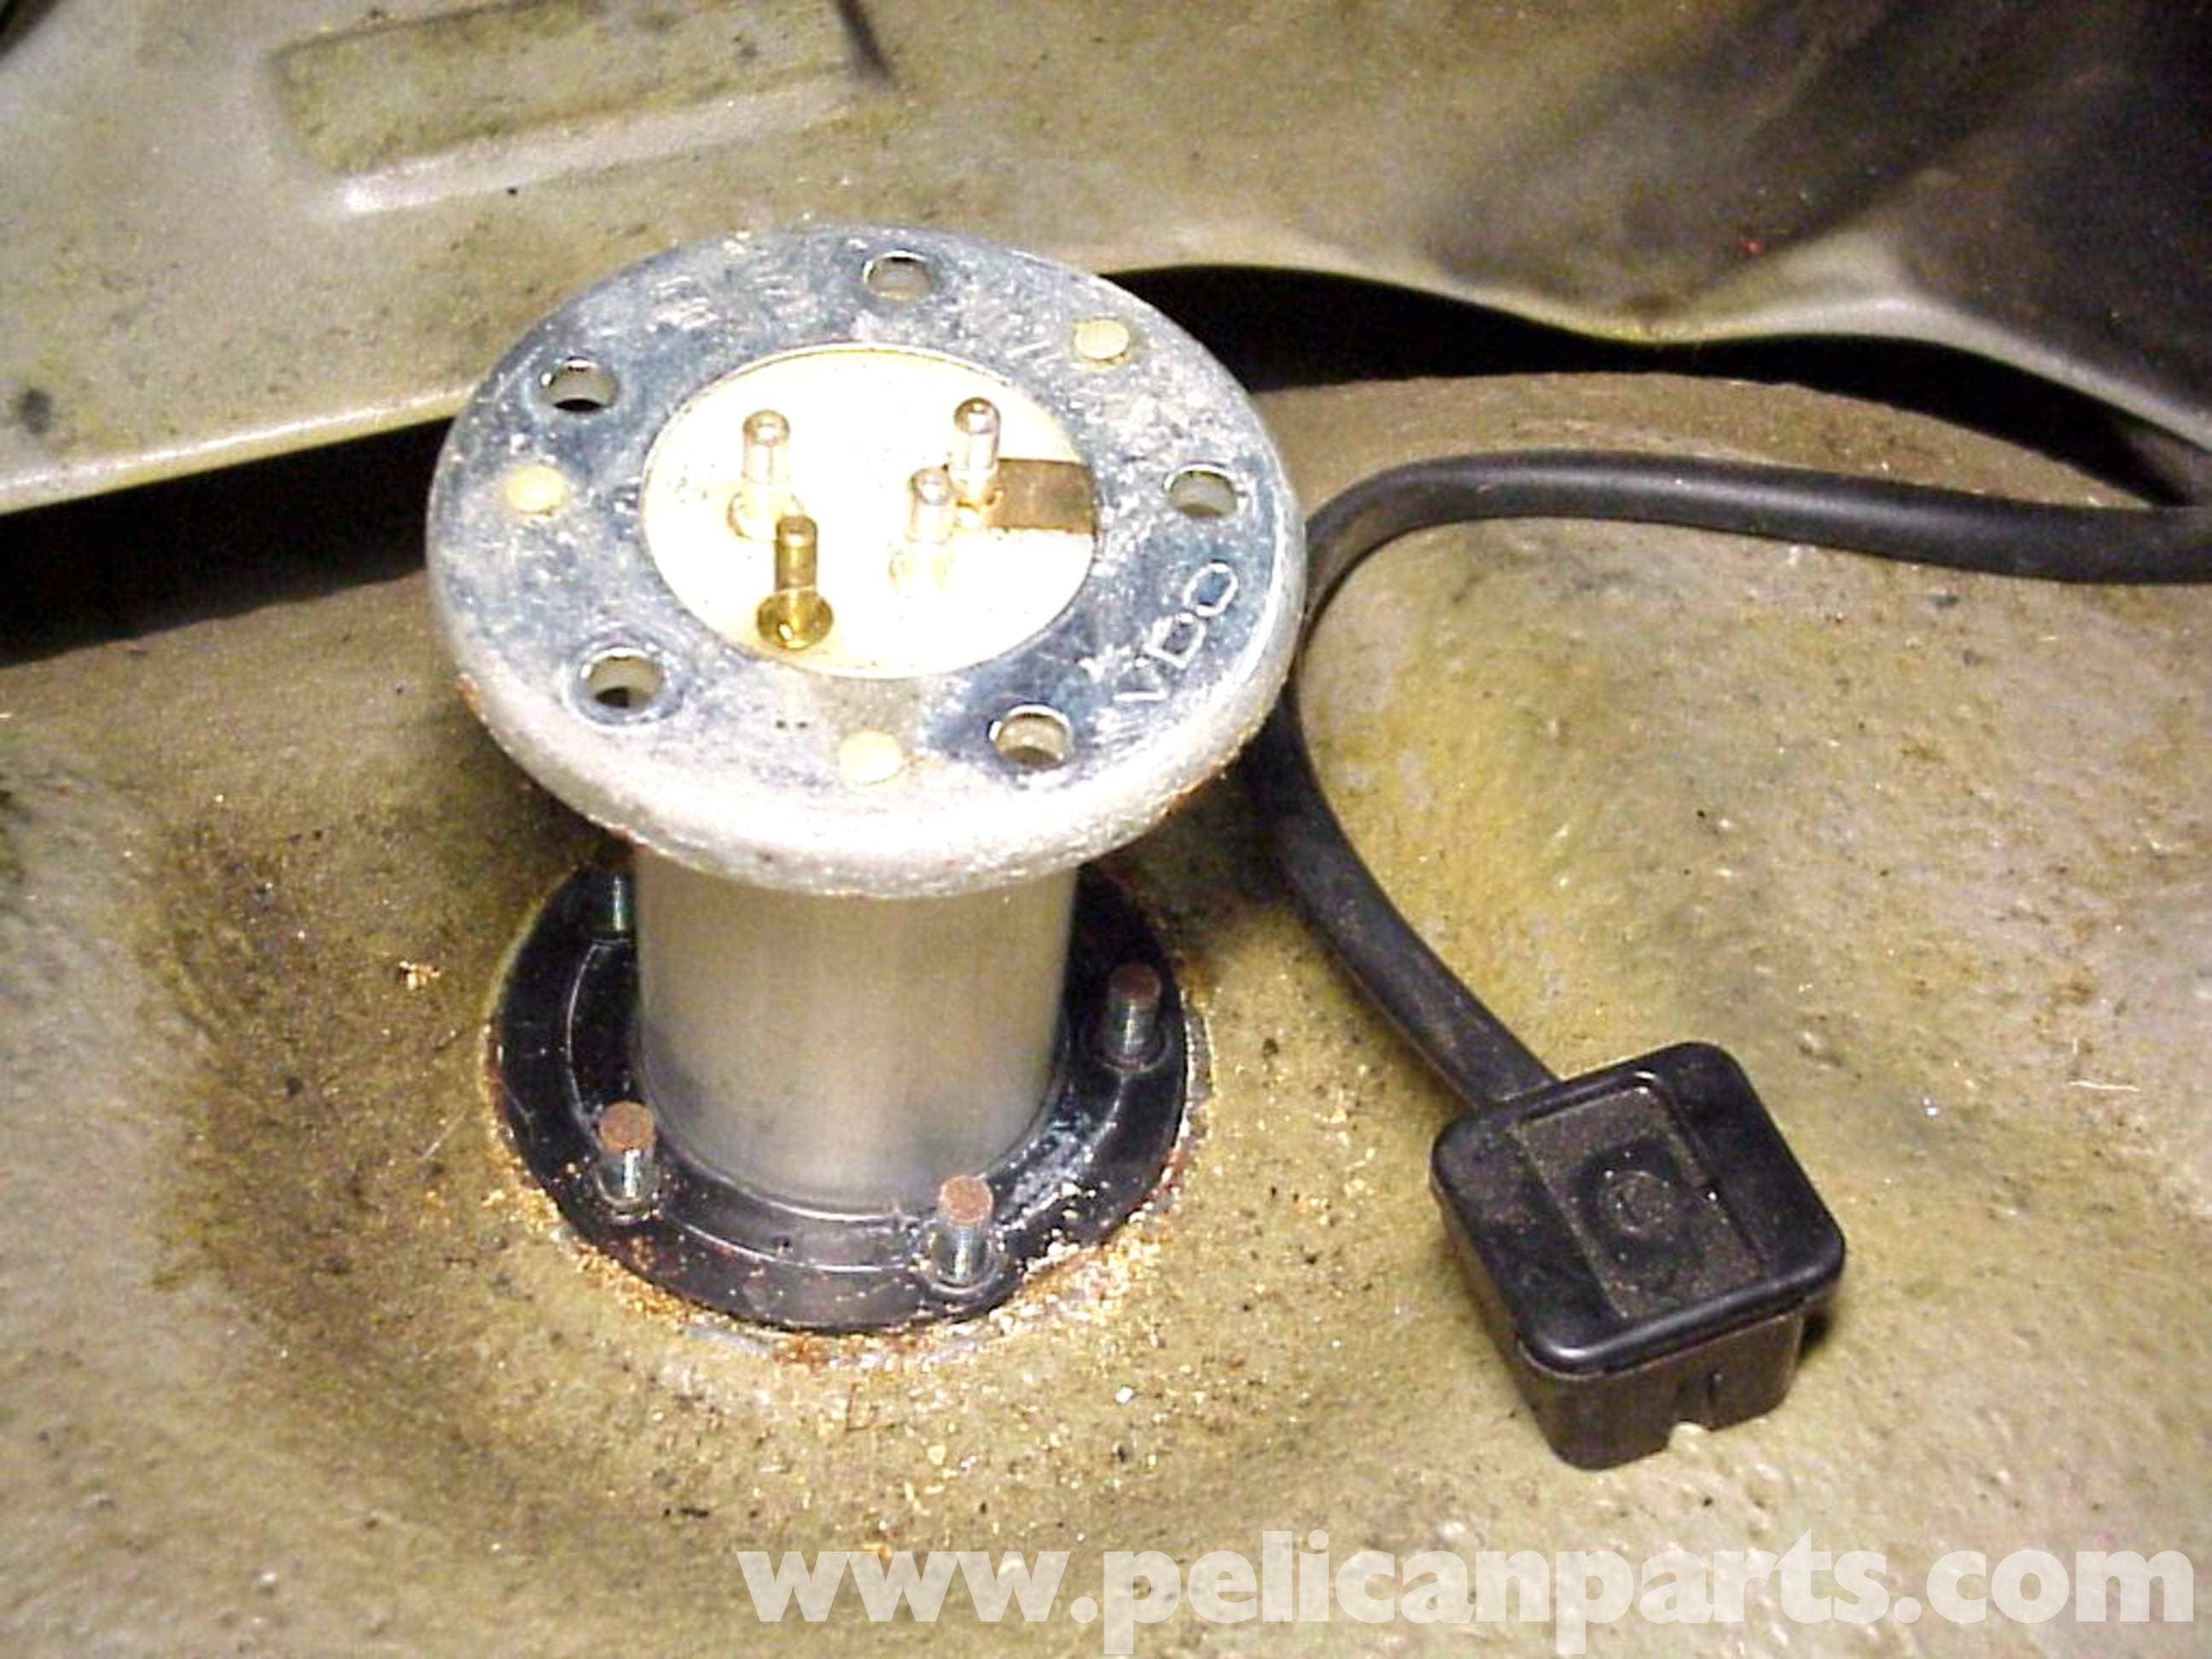 Porsche 911 Fuel Level Sender Replacement 911 1965 89